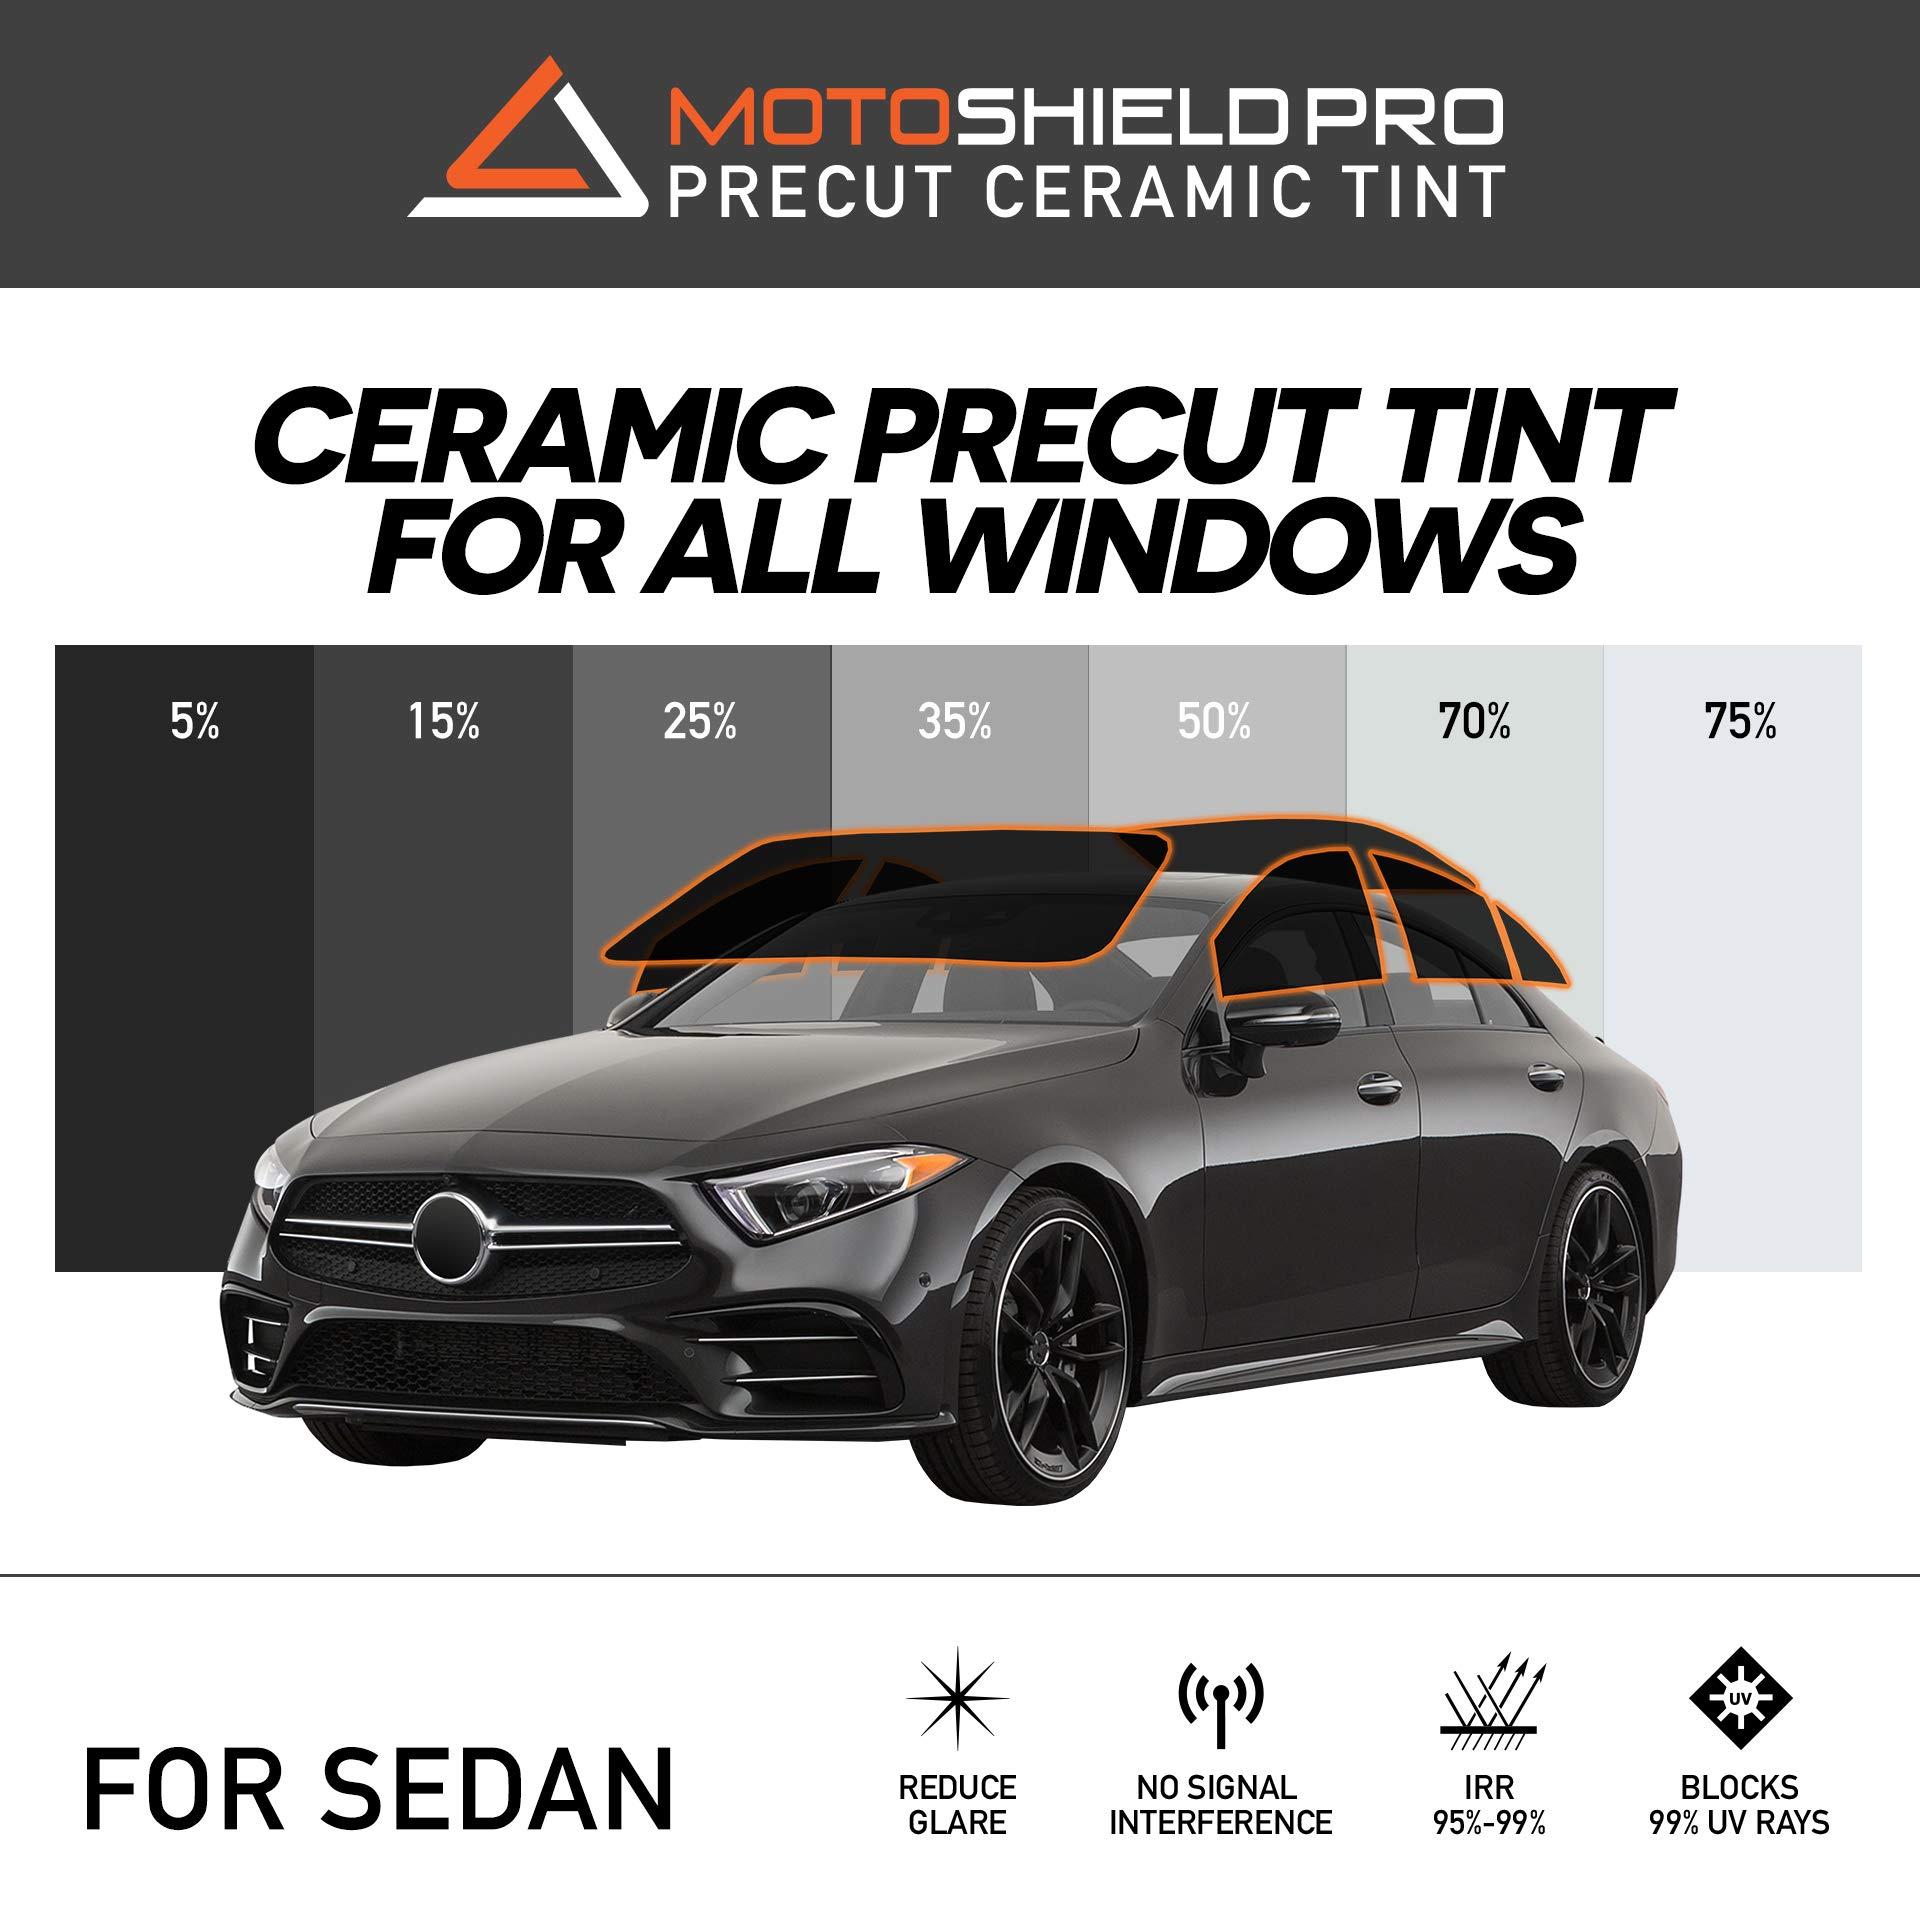 MotoShield Pro Precut Ceramic Tint Film [Blocks Up to 99% of UV/IRR Rays] Window Tint for Sedan - All Windows, Any Tint Shade by MotoShield Pro